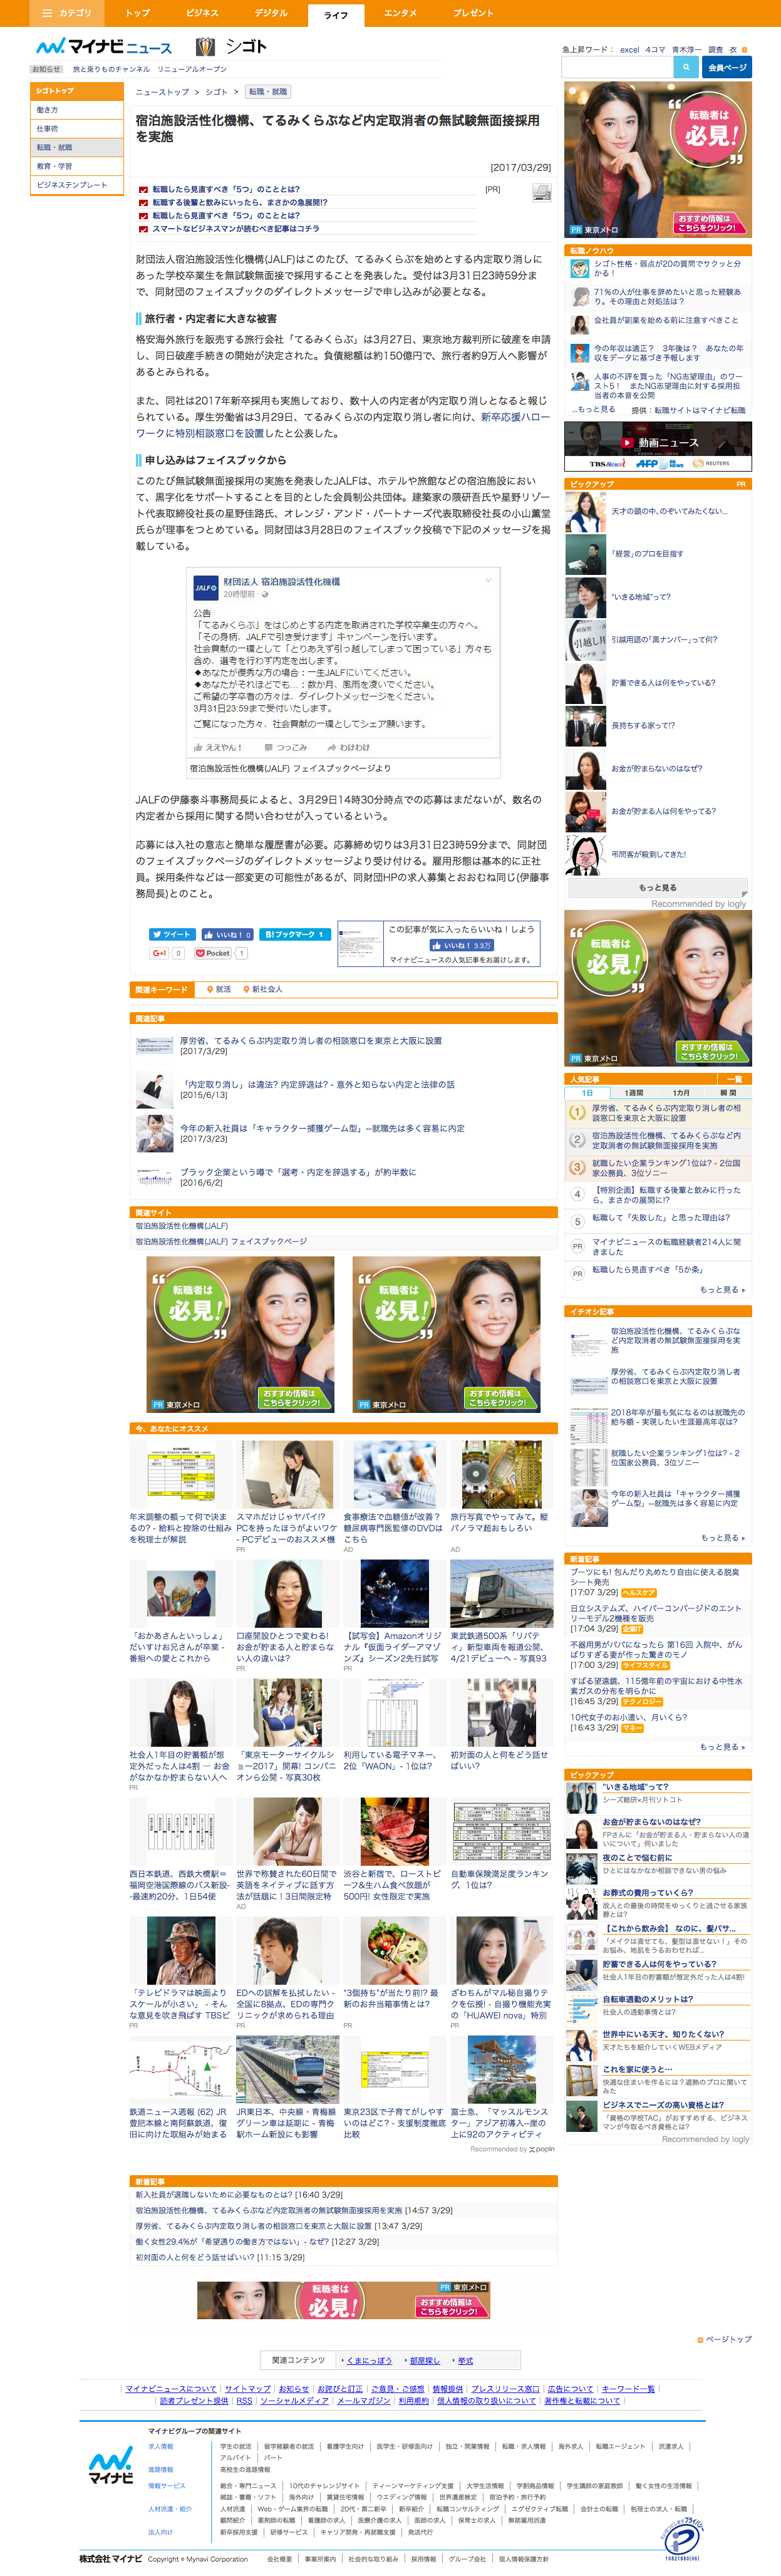 news.mynavi.jp:news:2017:03:29:199:.png